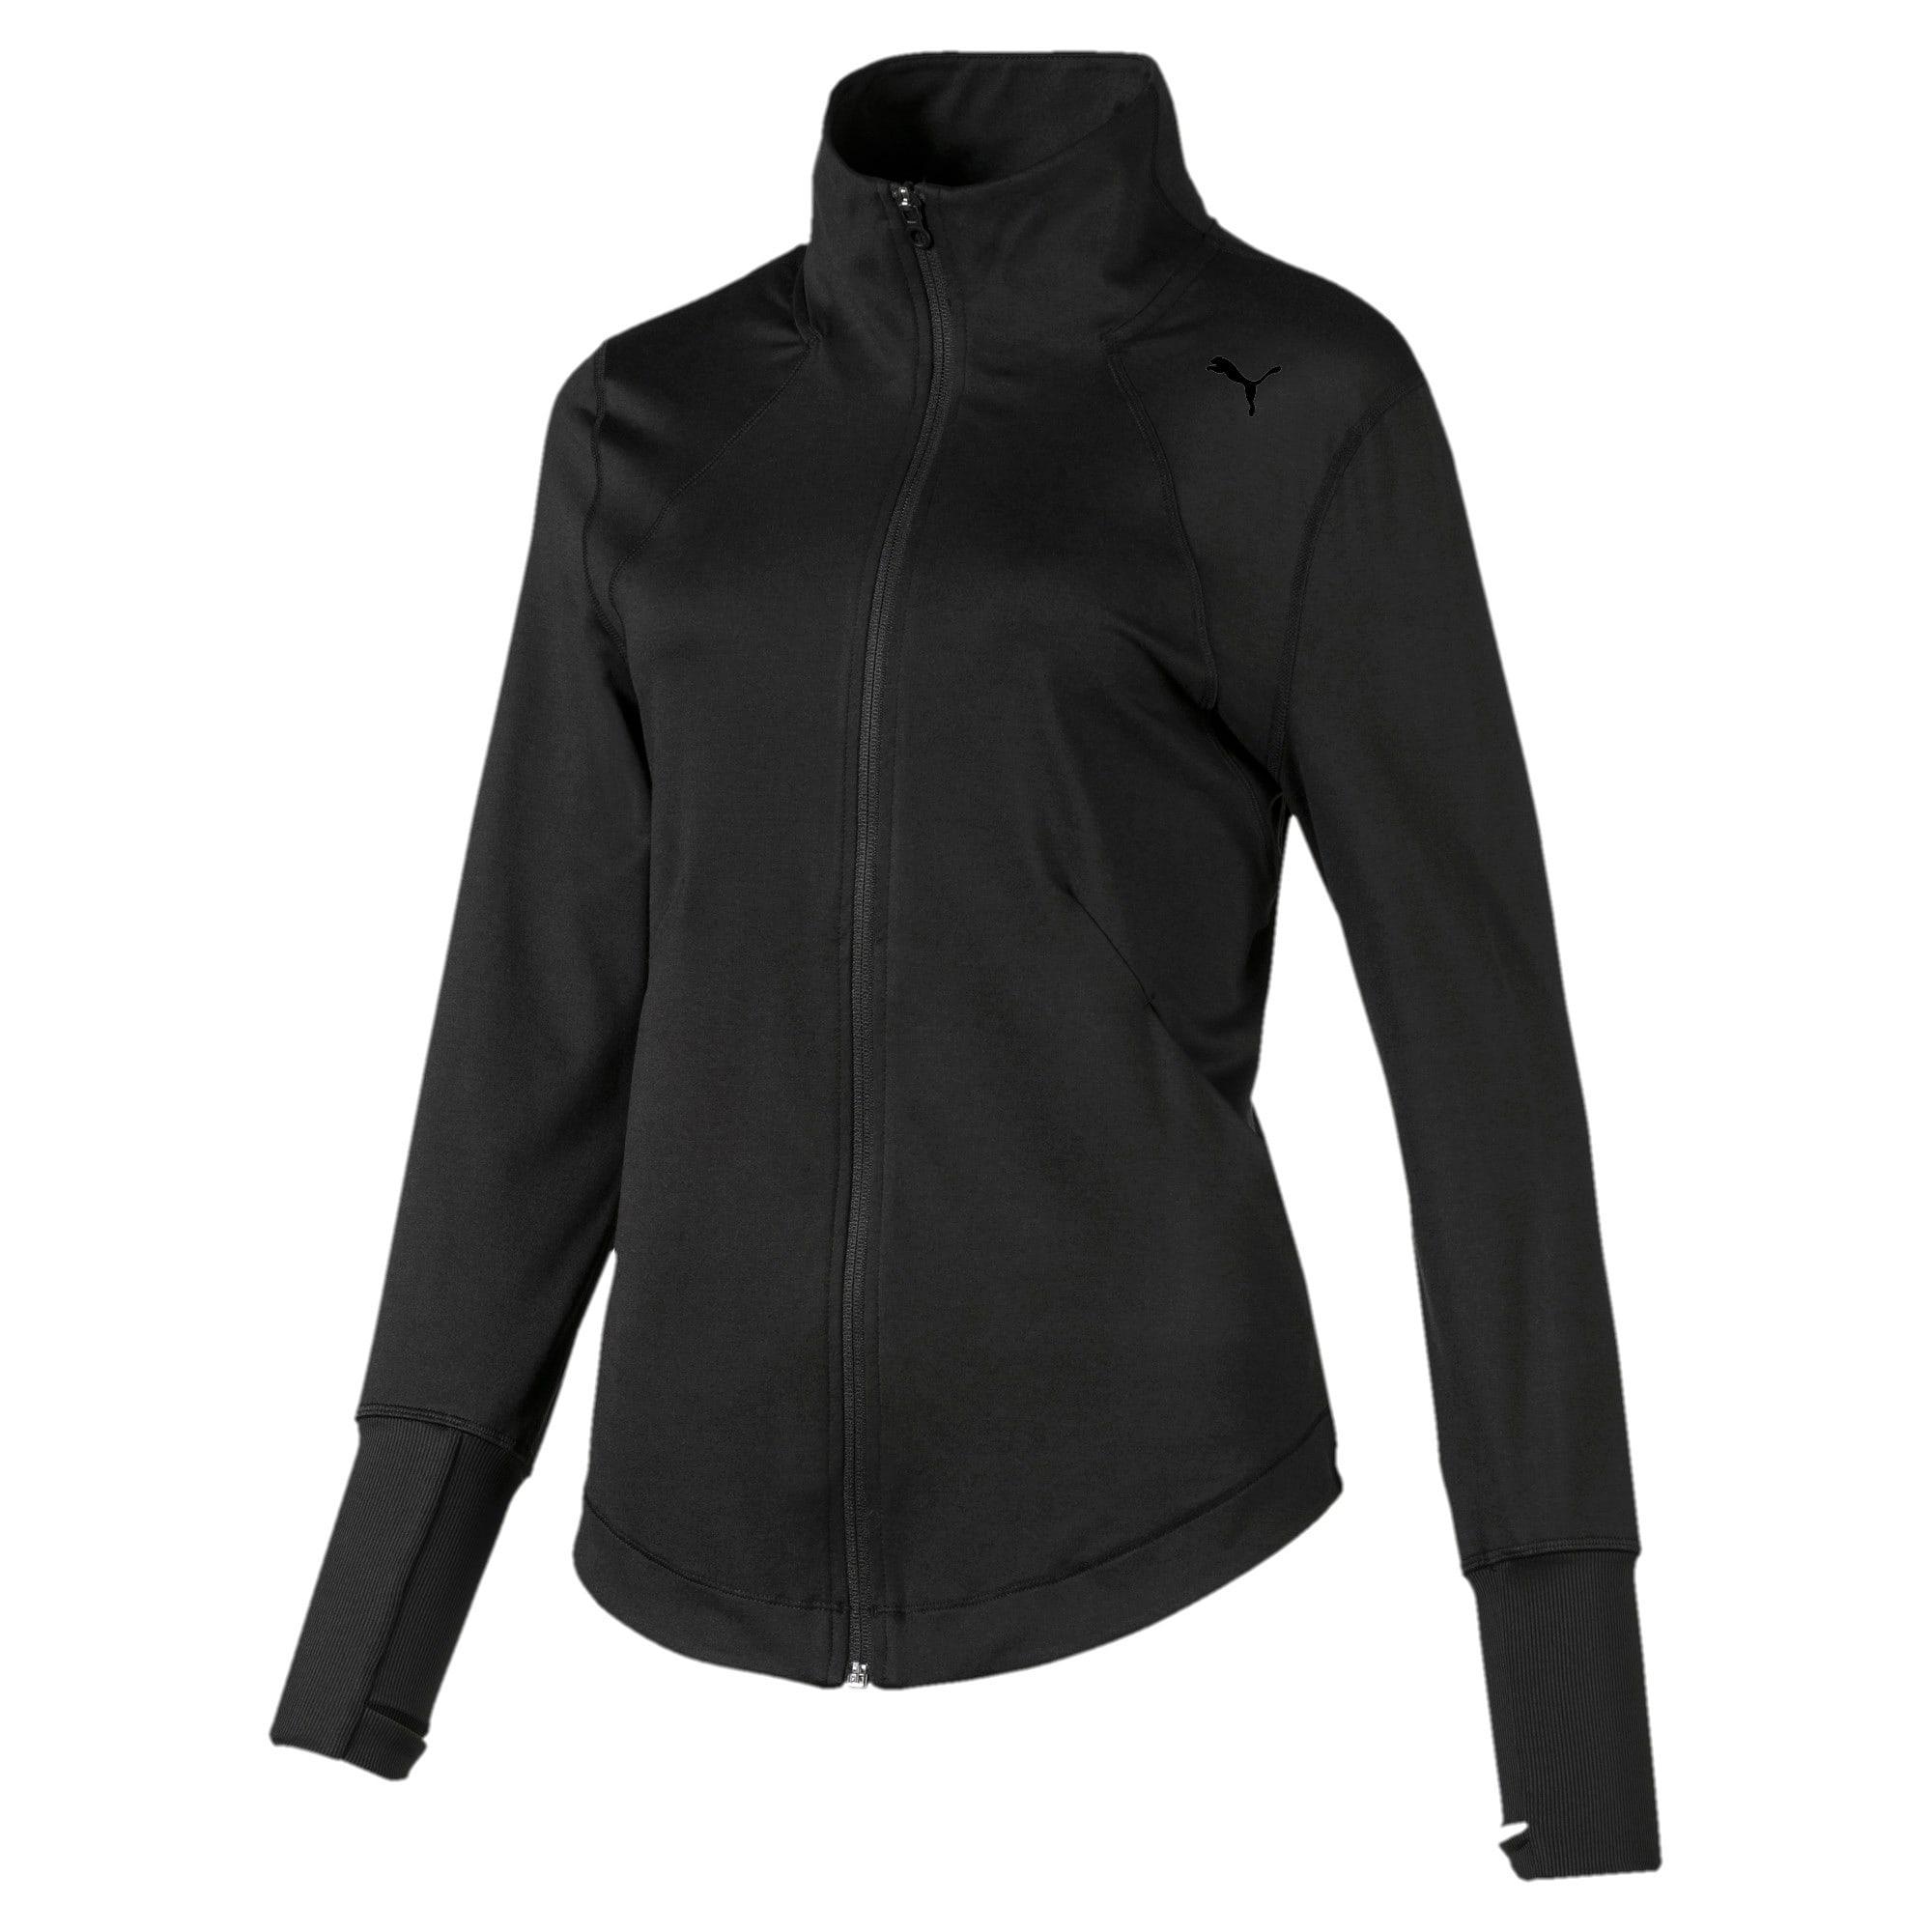 Thumbnail 3 of Studio Knit Women's Training Jacket, Puma Black, medium